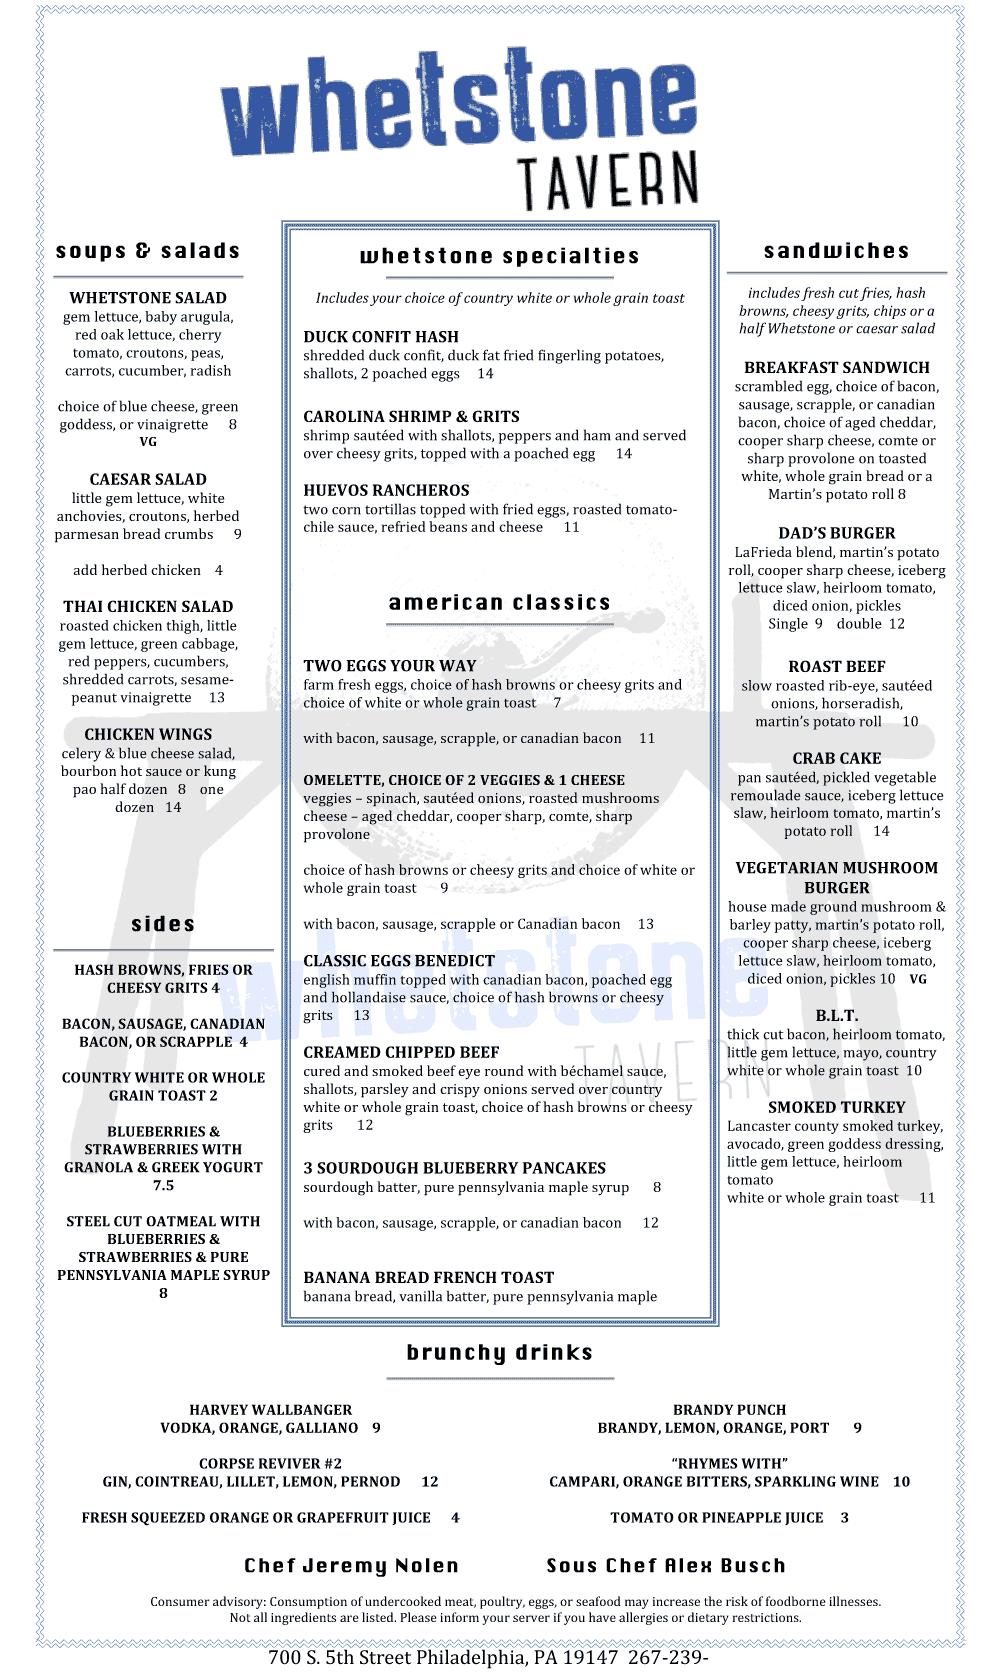 Whetstone-Tavern-Brunch-Menu-8.25